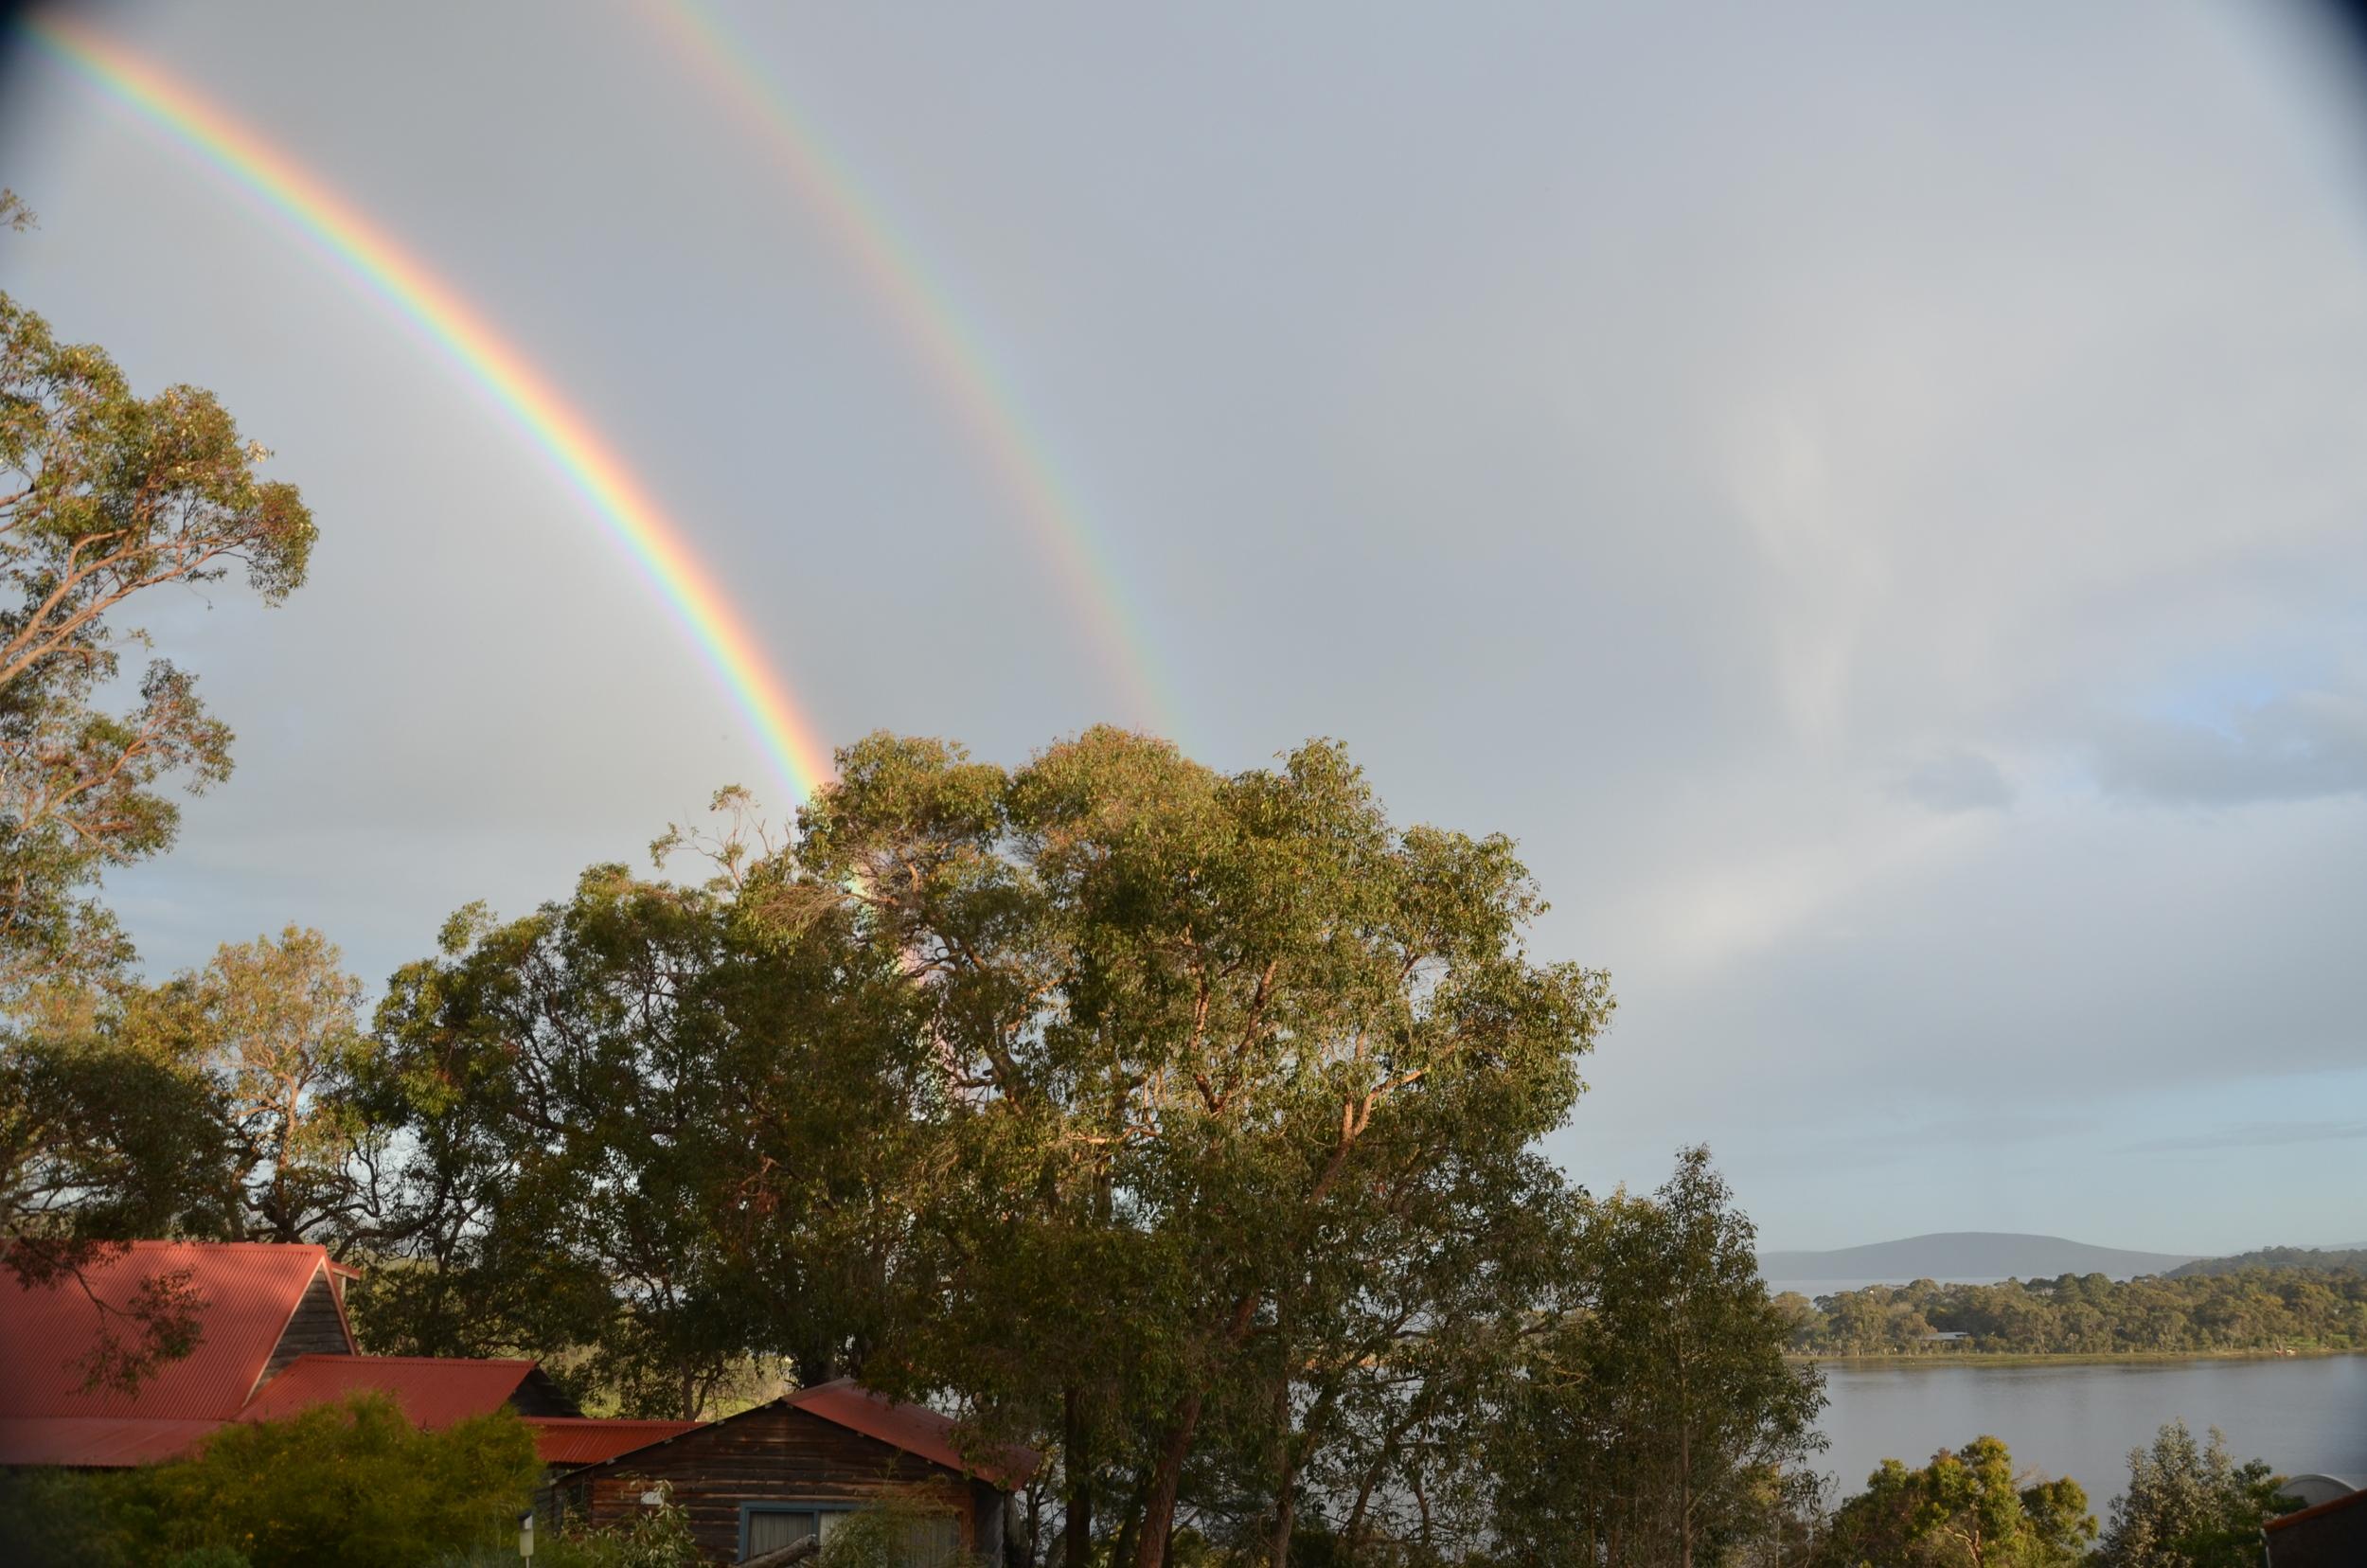 Lucky double rainbow over Debbie and Rob's house!